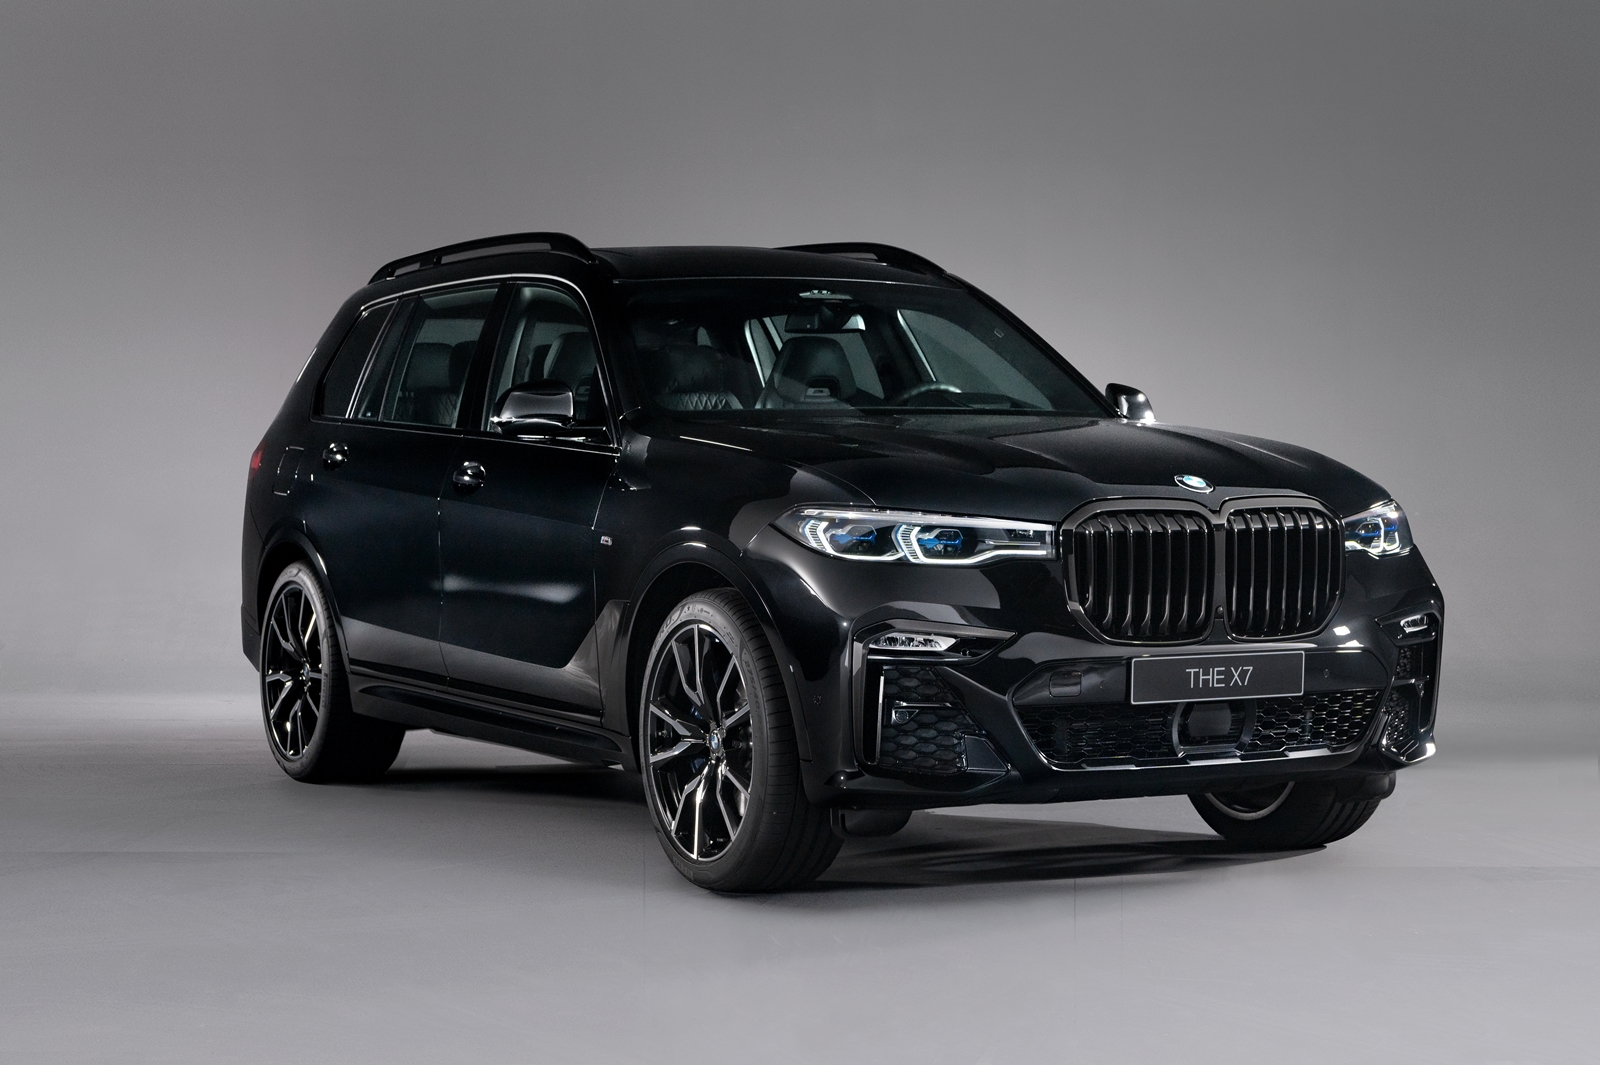 BMW X7 Dark Knight曜黑版。